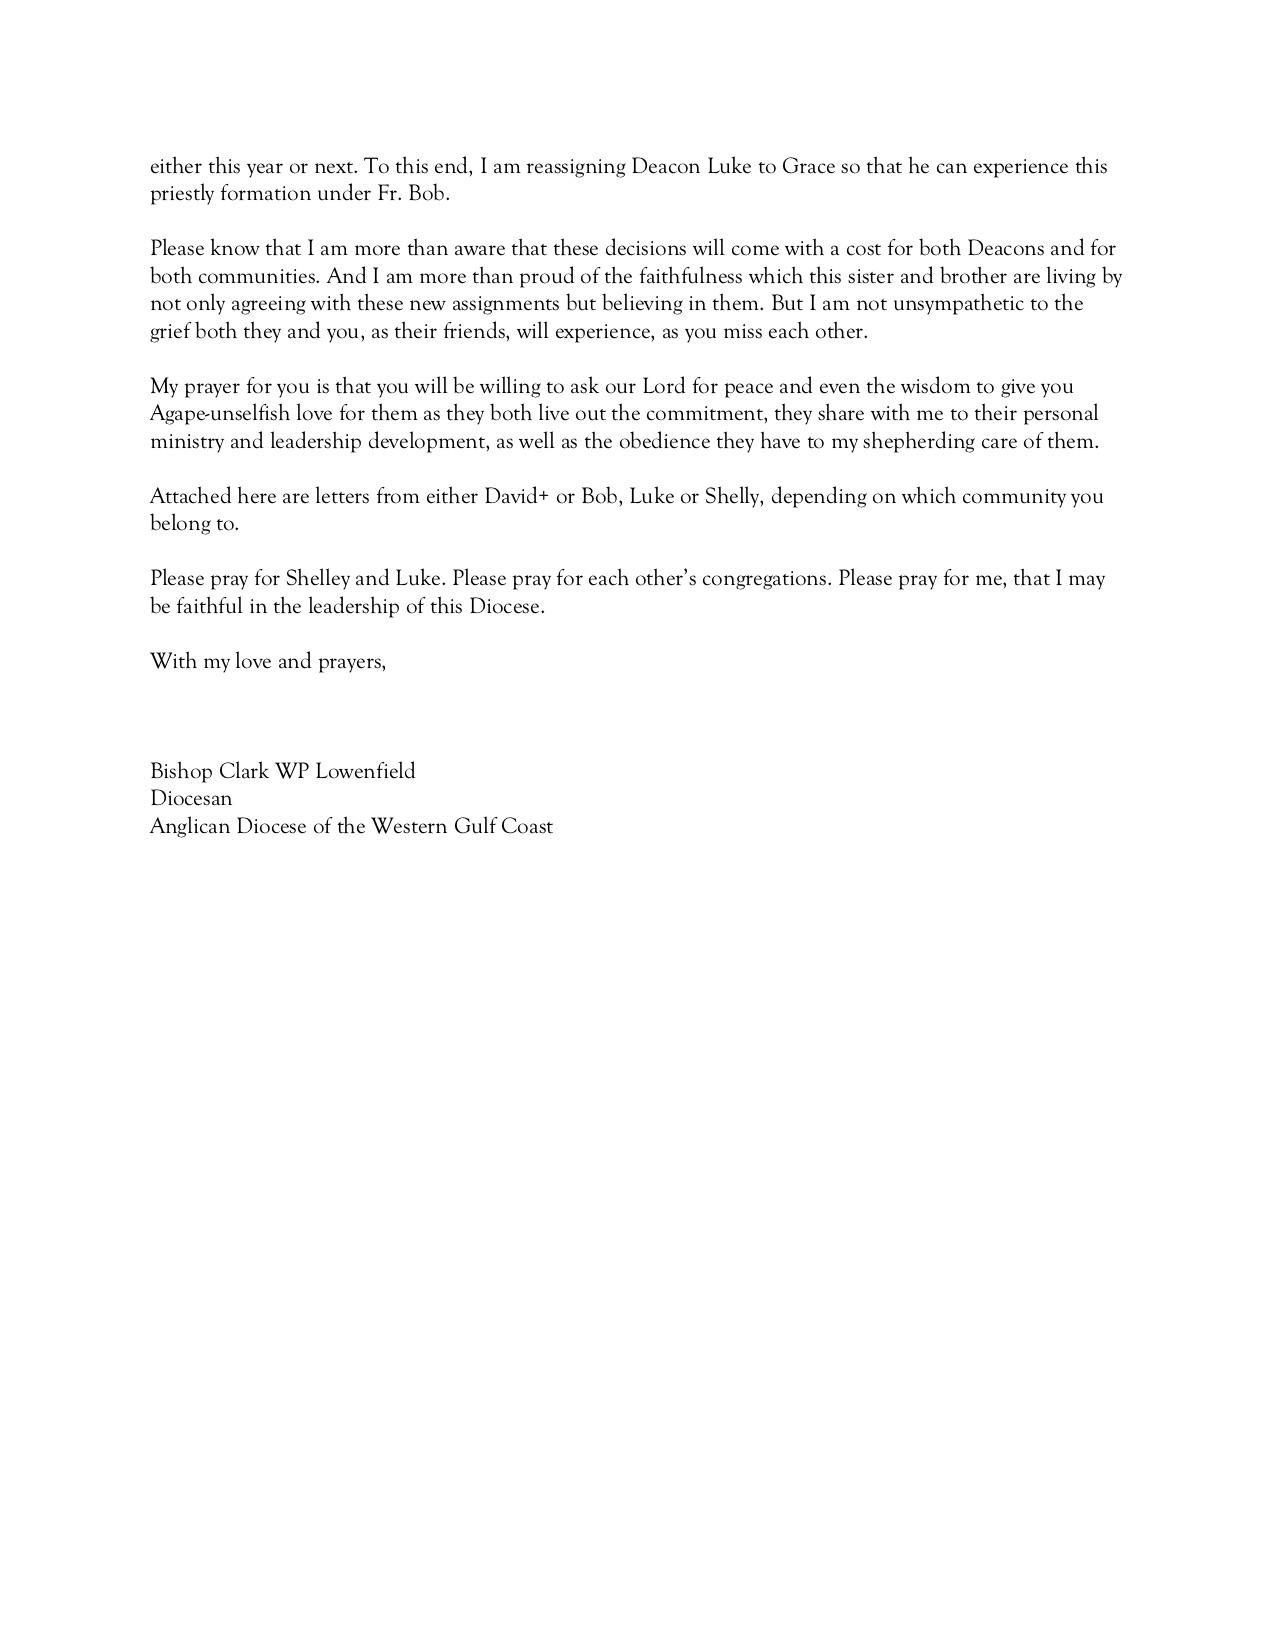 Bishop Clark Letter Regarding Luke and Shelley - 2.jpg